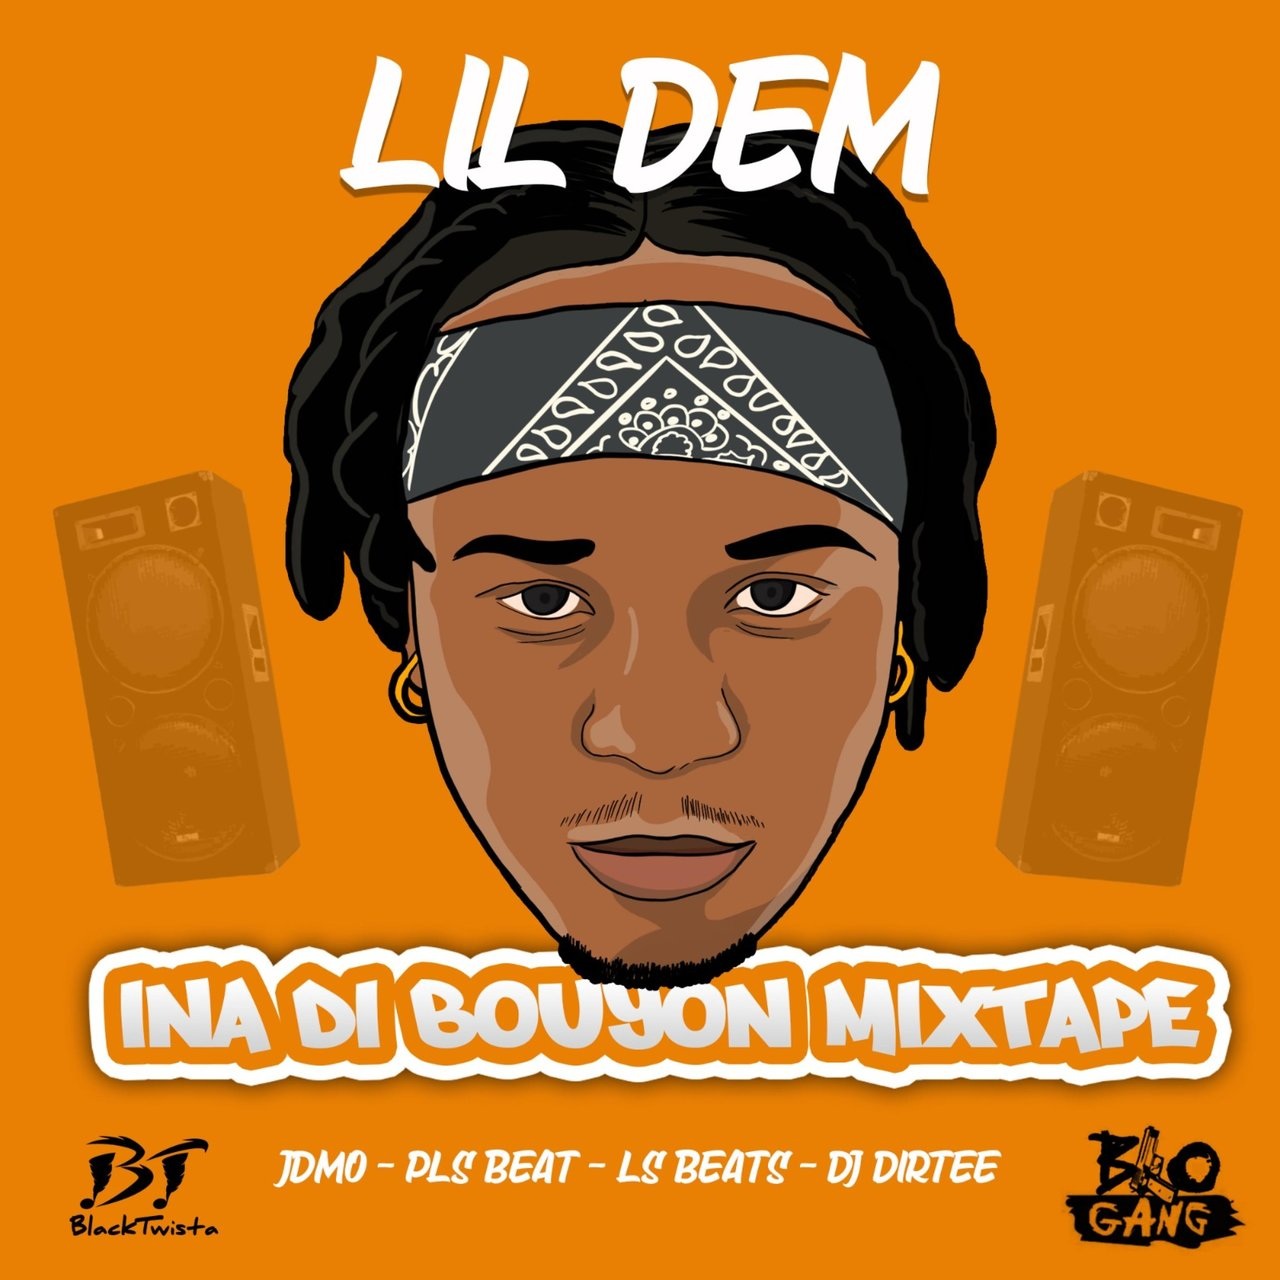 Lil Dem - Ina Di Bouyon Mixtape (Cover)